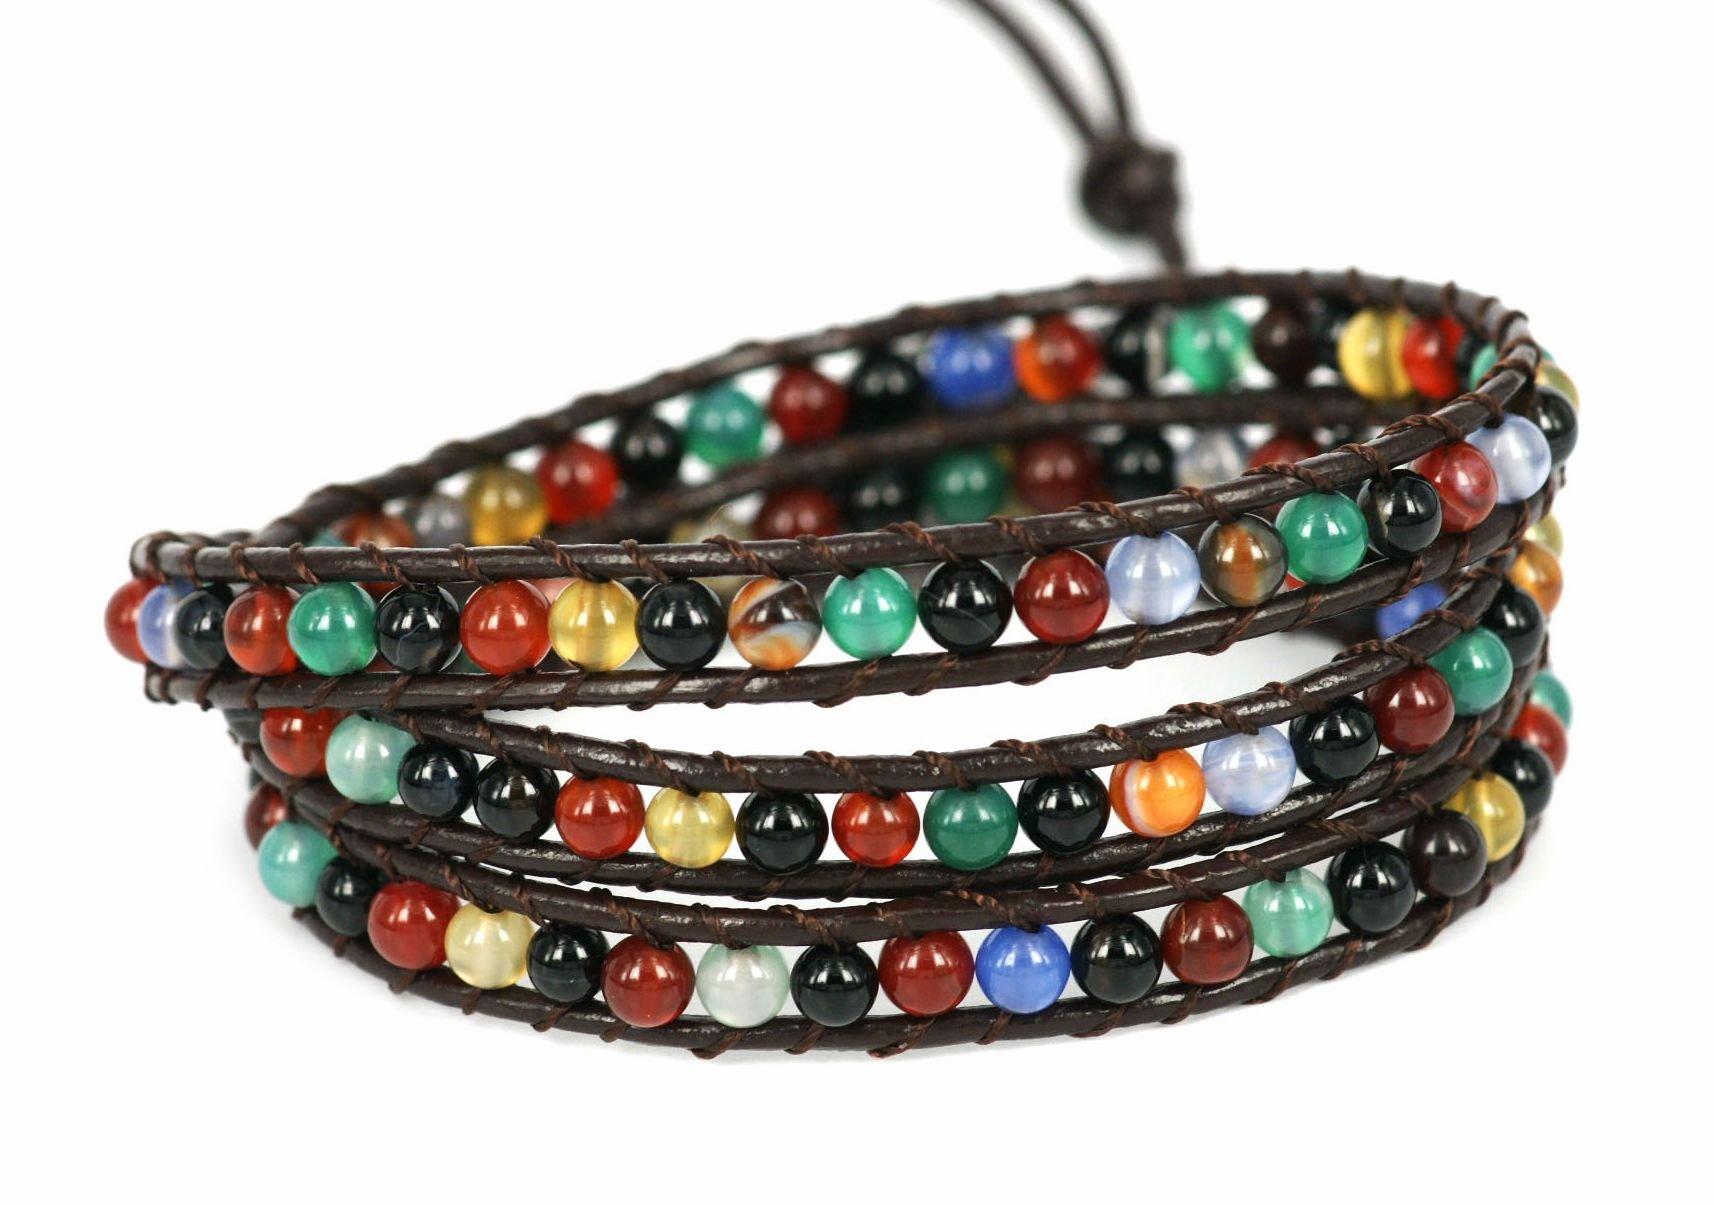 BLUEYES COLLECTION 3 Wrap Genuine Leather Bracelet Gemstone Bead (Multi-Color)